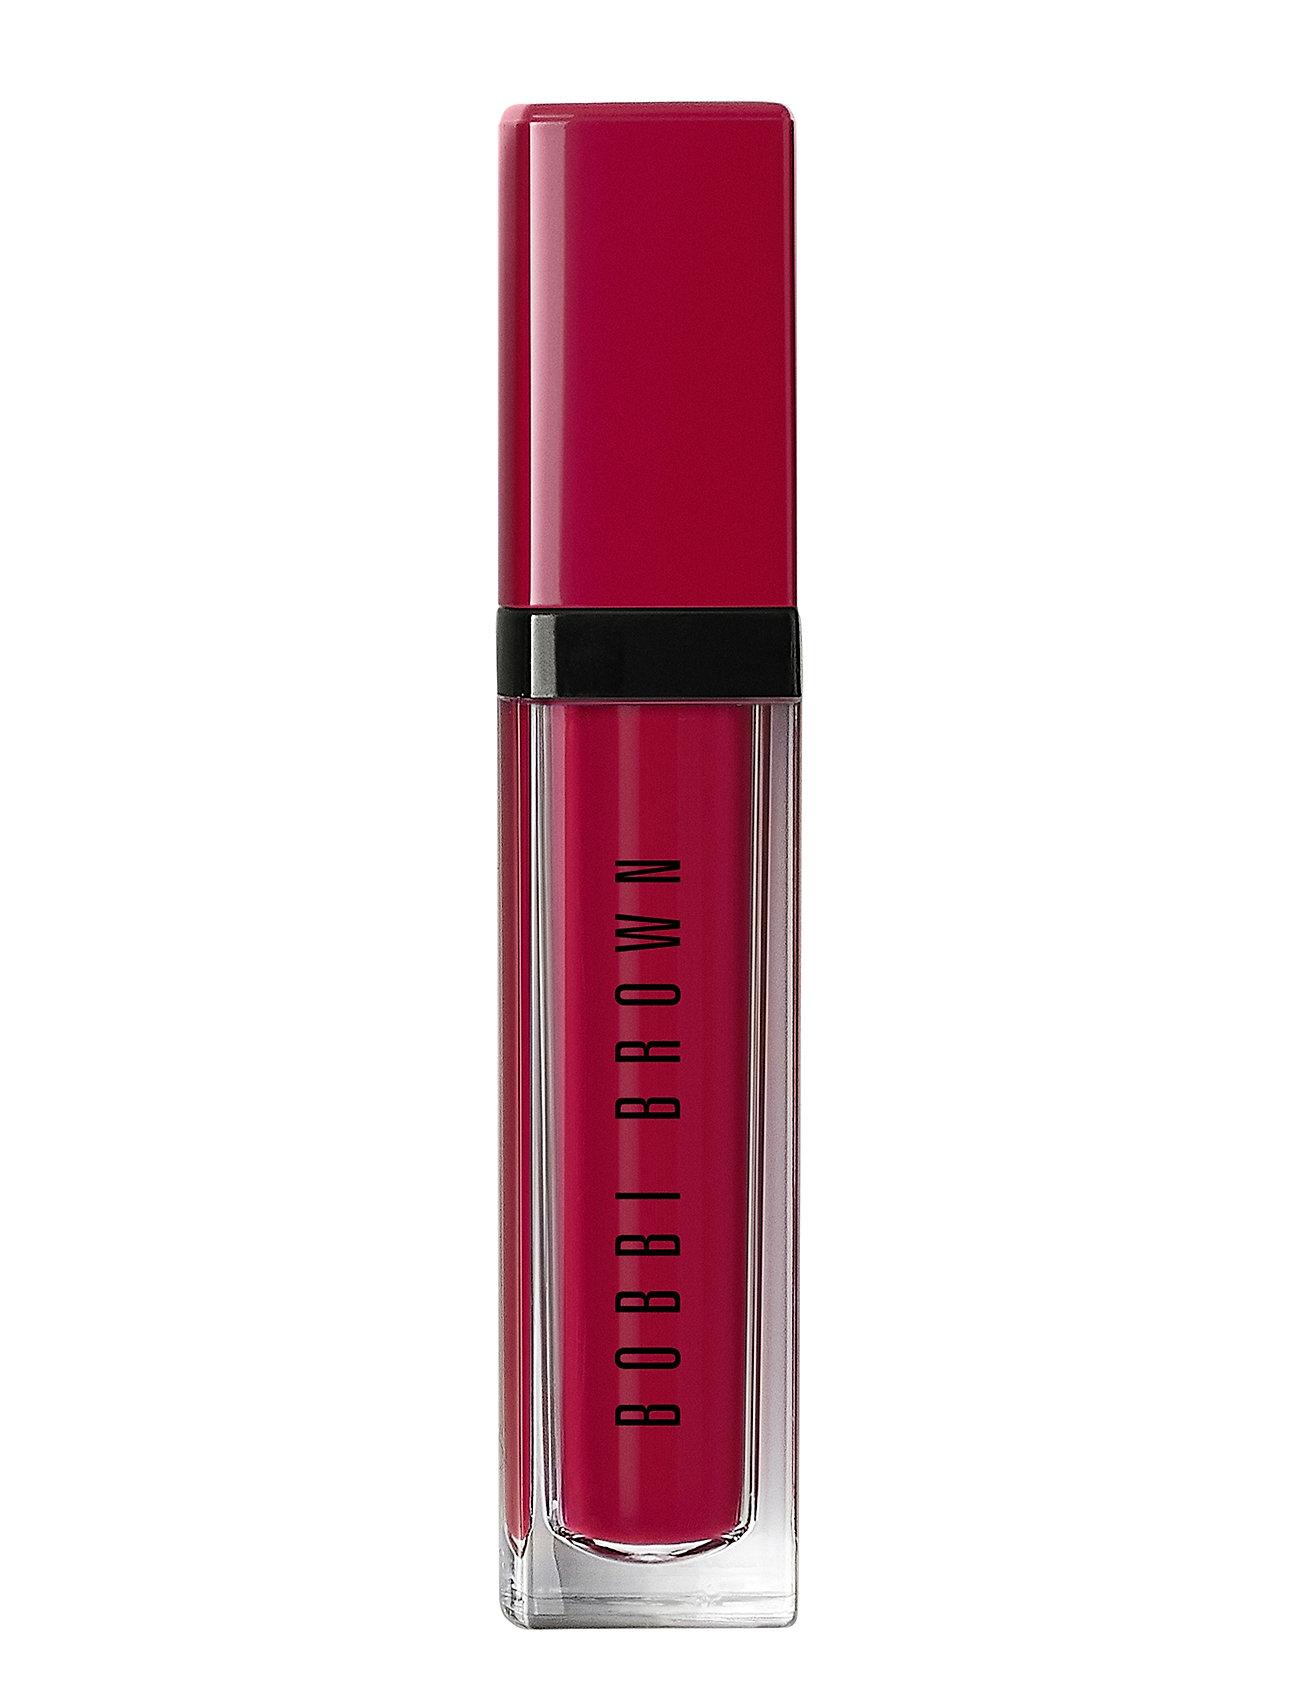 Image of Crushed Liquid Lipgloss Makeup Rød Bobbi Brown (3431130875)